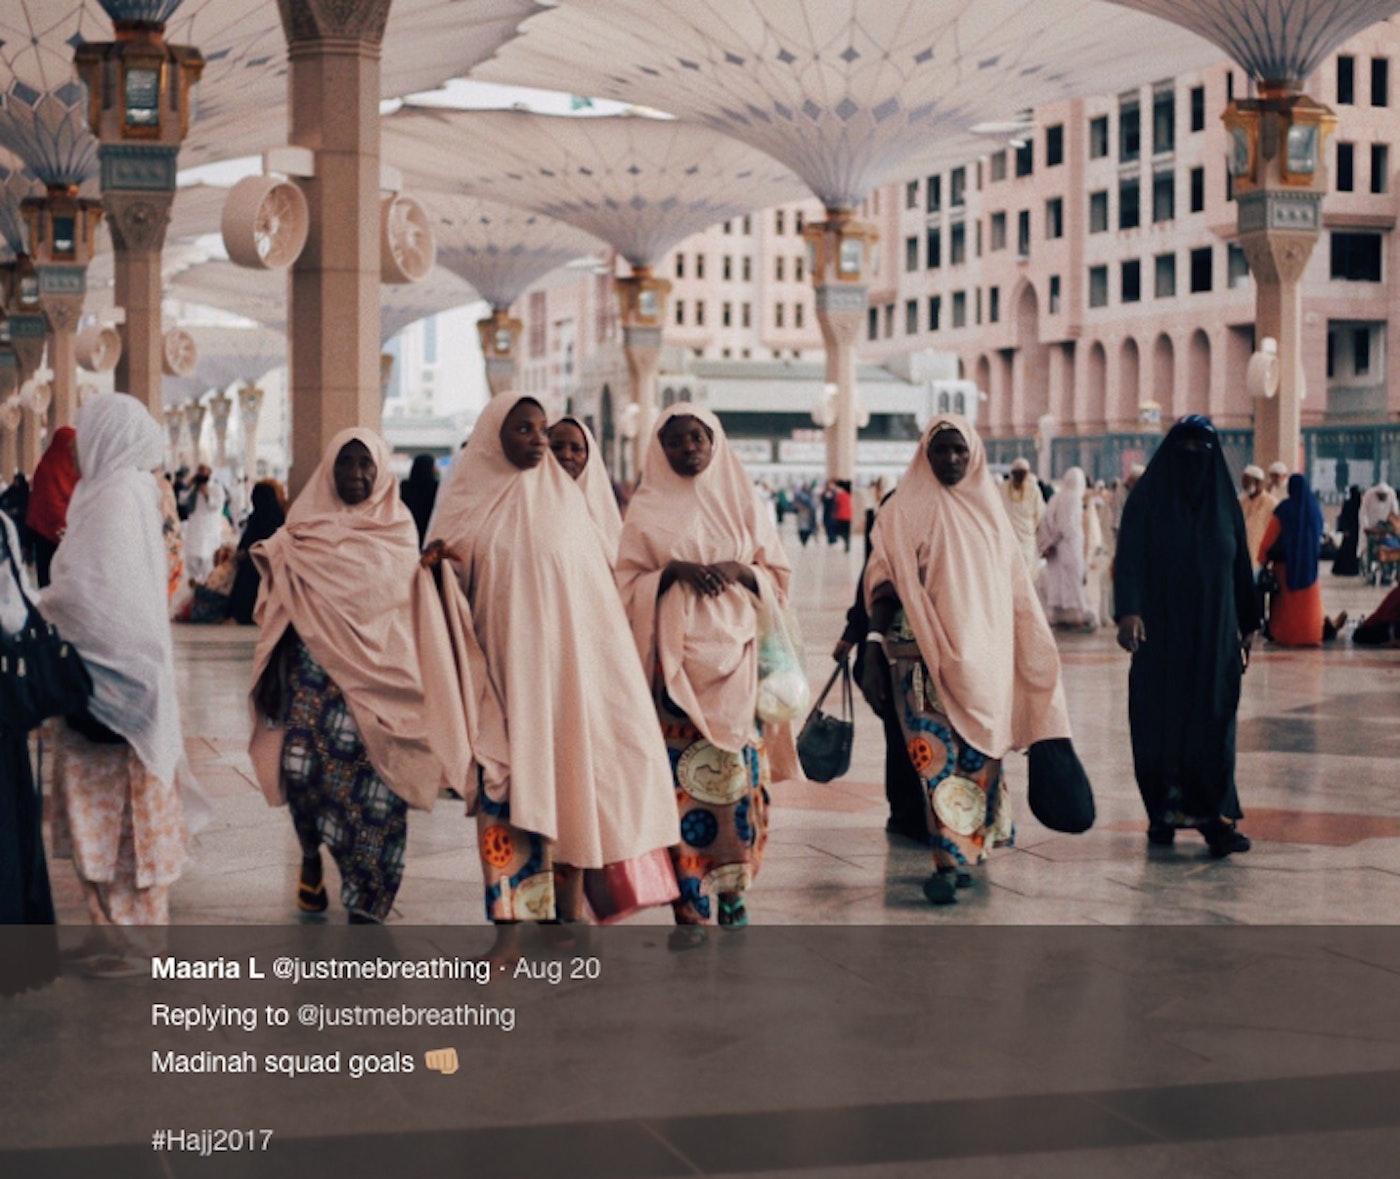 I Don't Know if I Will Ever Go on Hajj but I Have Seen It All   Amaliah